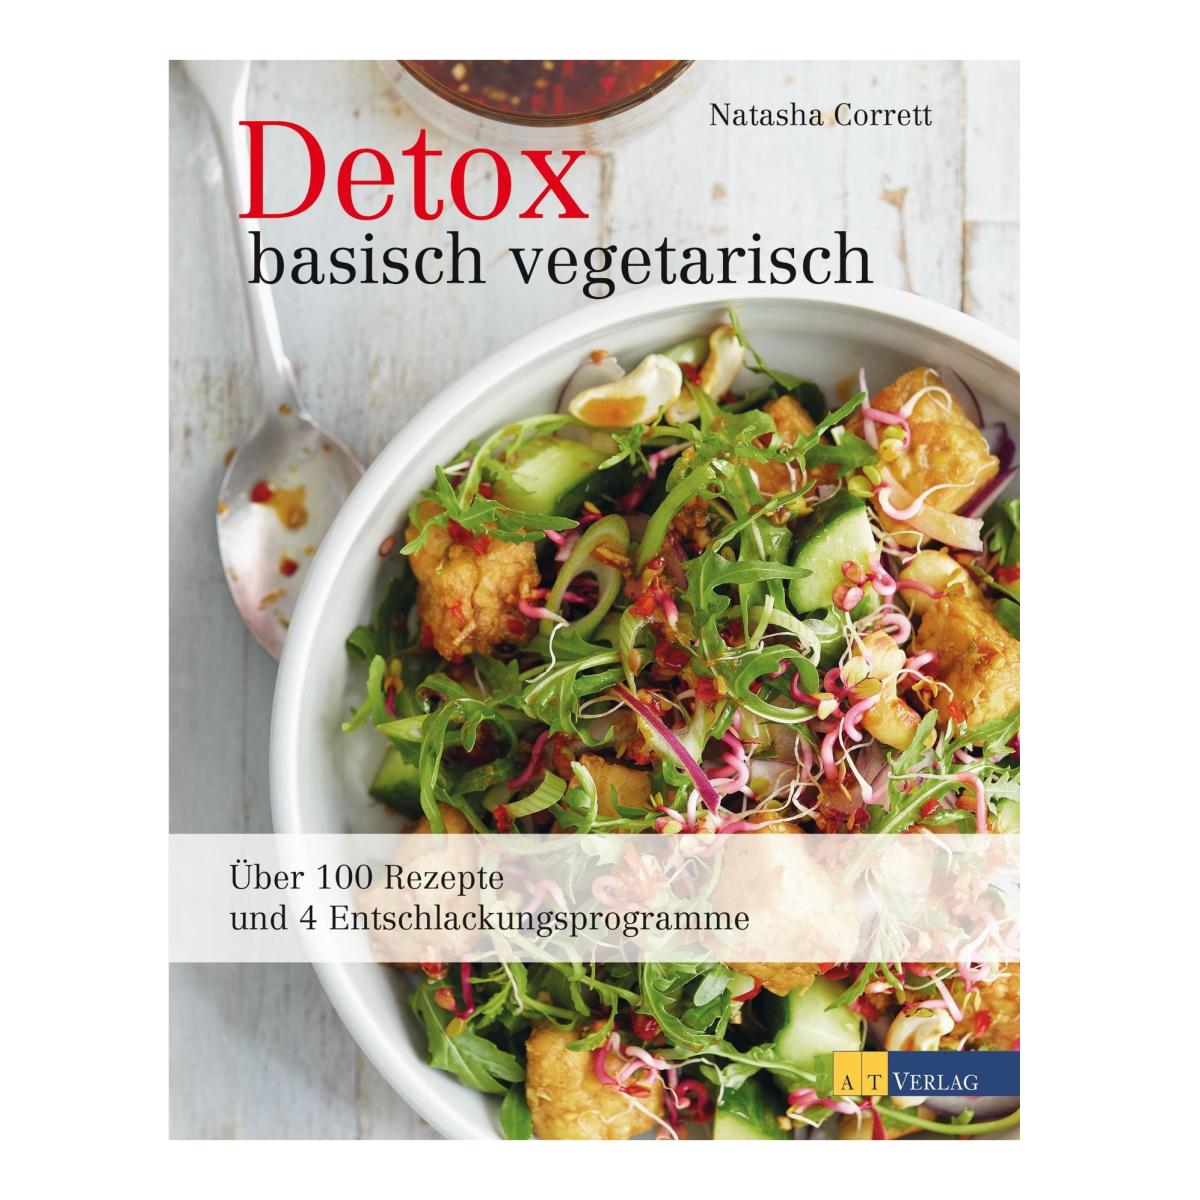 Cover Detox basisch vegetarsich